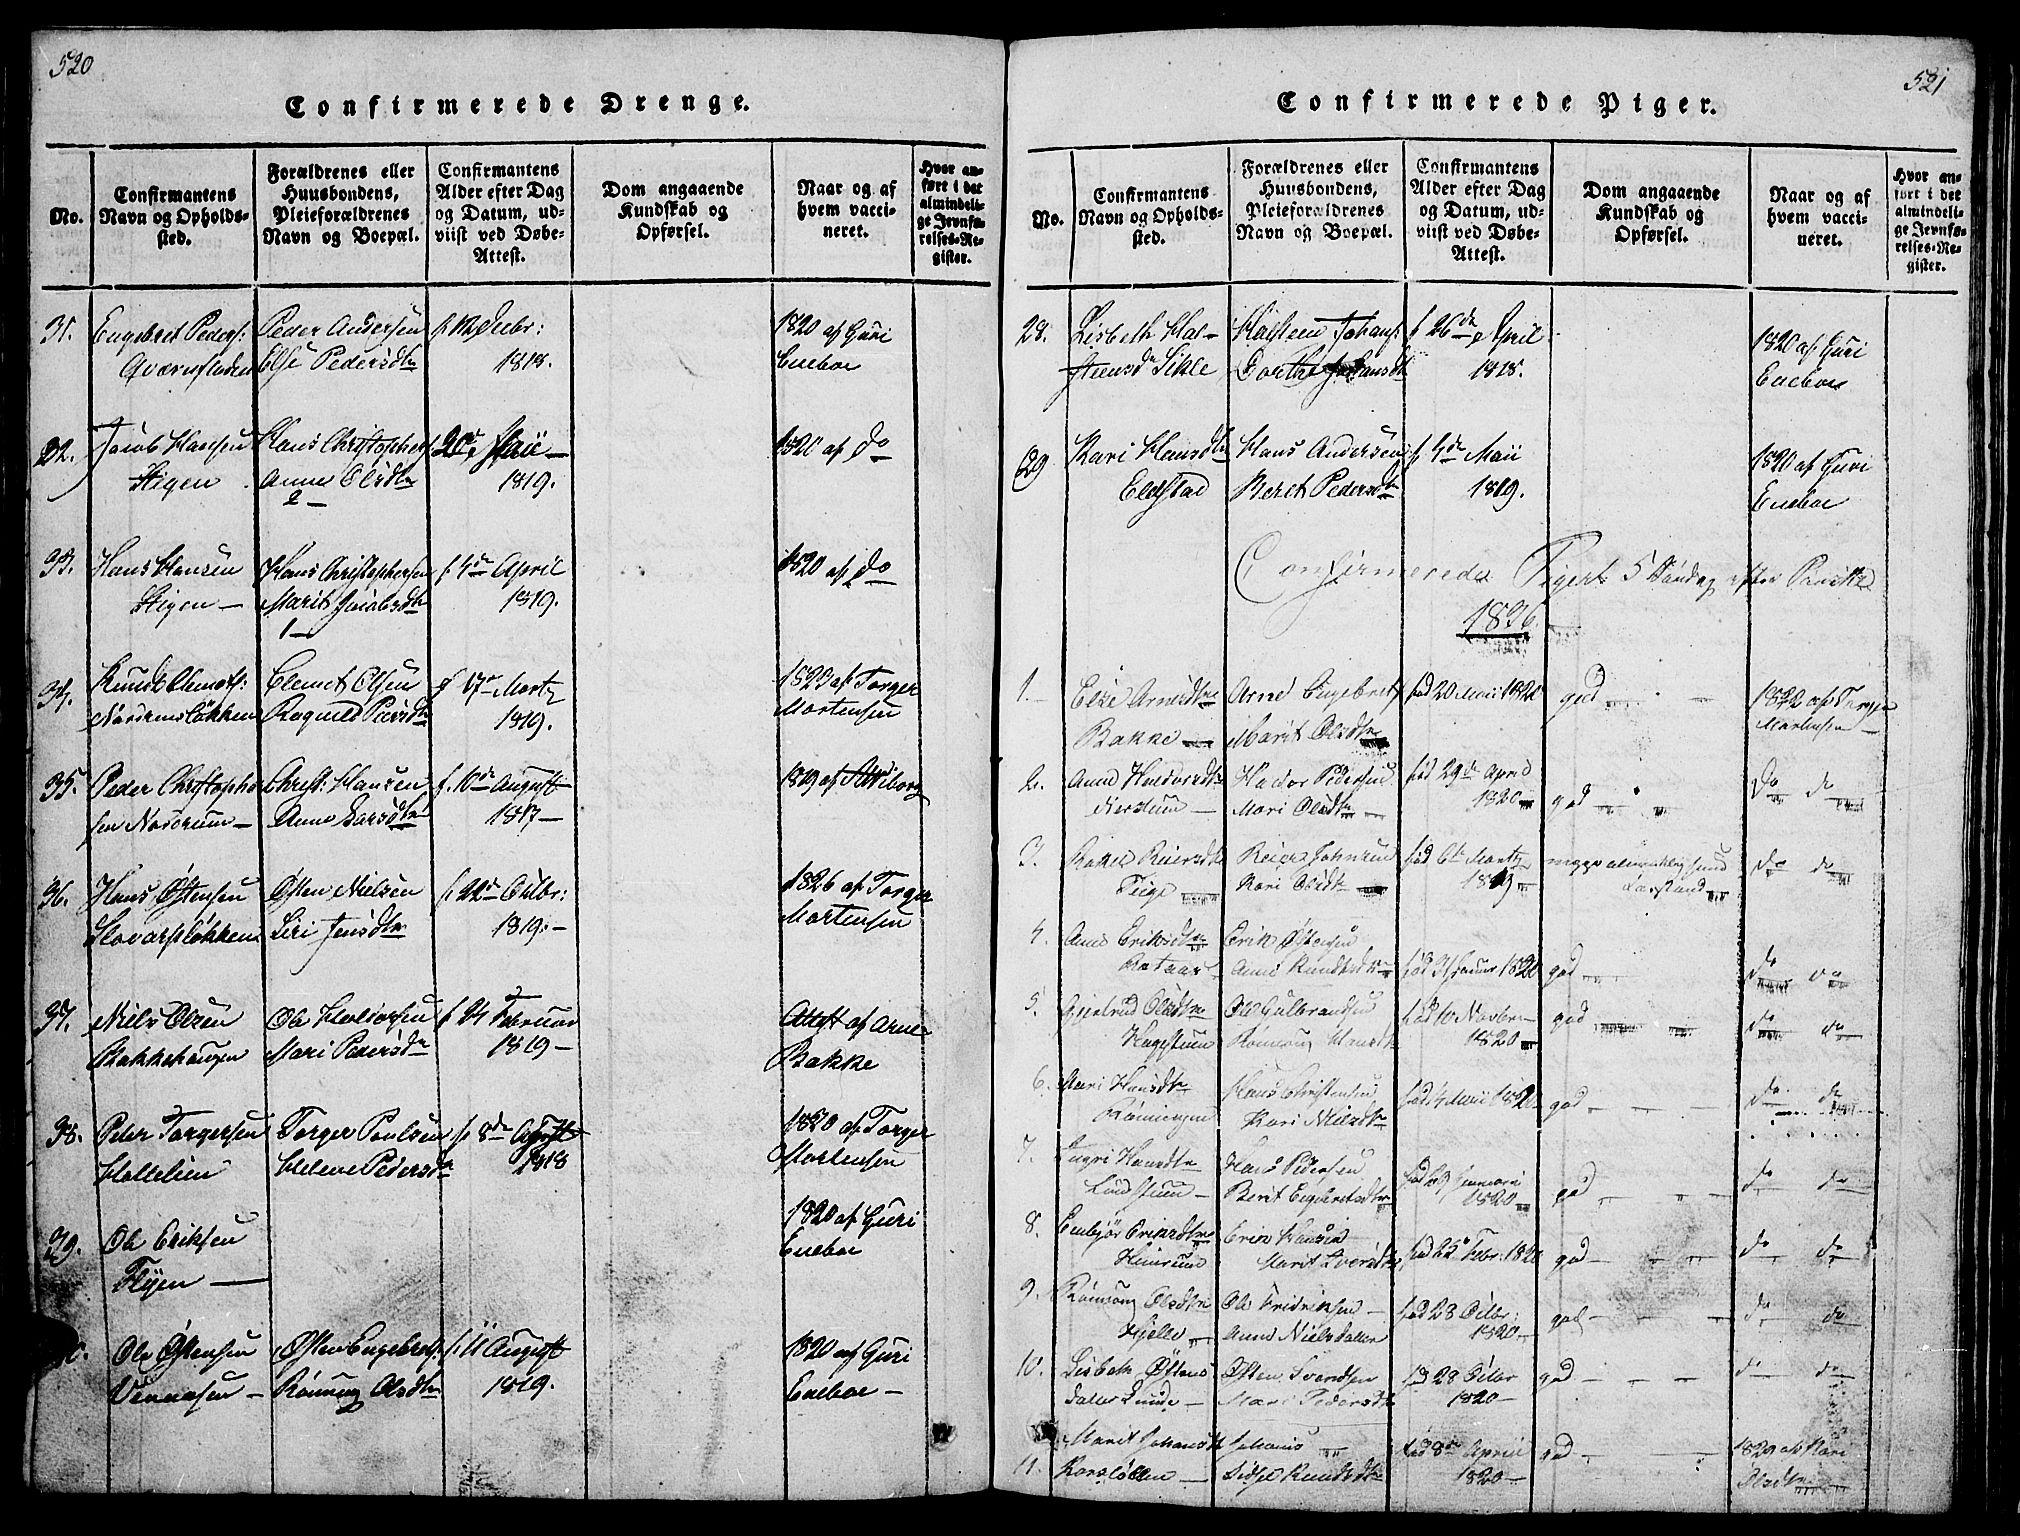 SAH, Ringebu prestekontor, Klokkerbok nr. 1, 1821-1839, s. 520-521